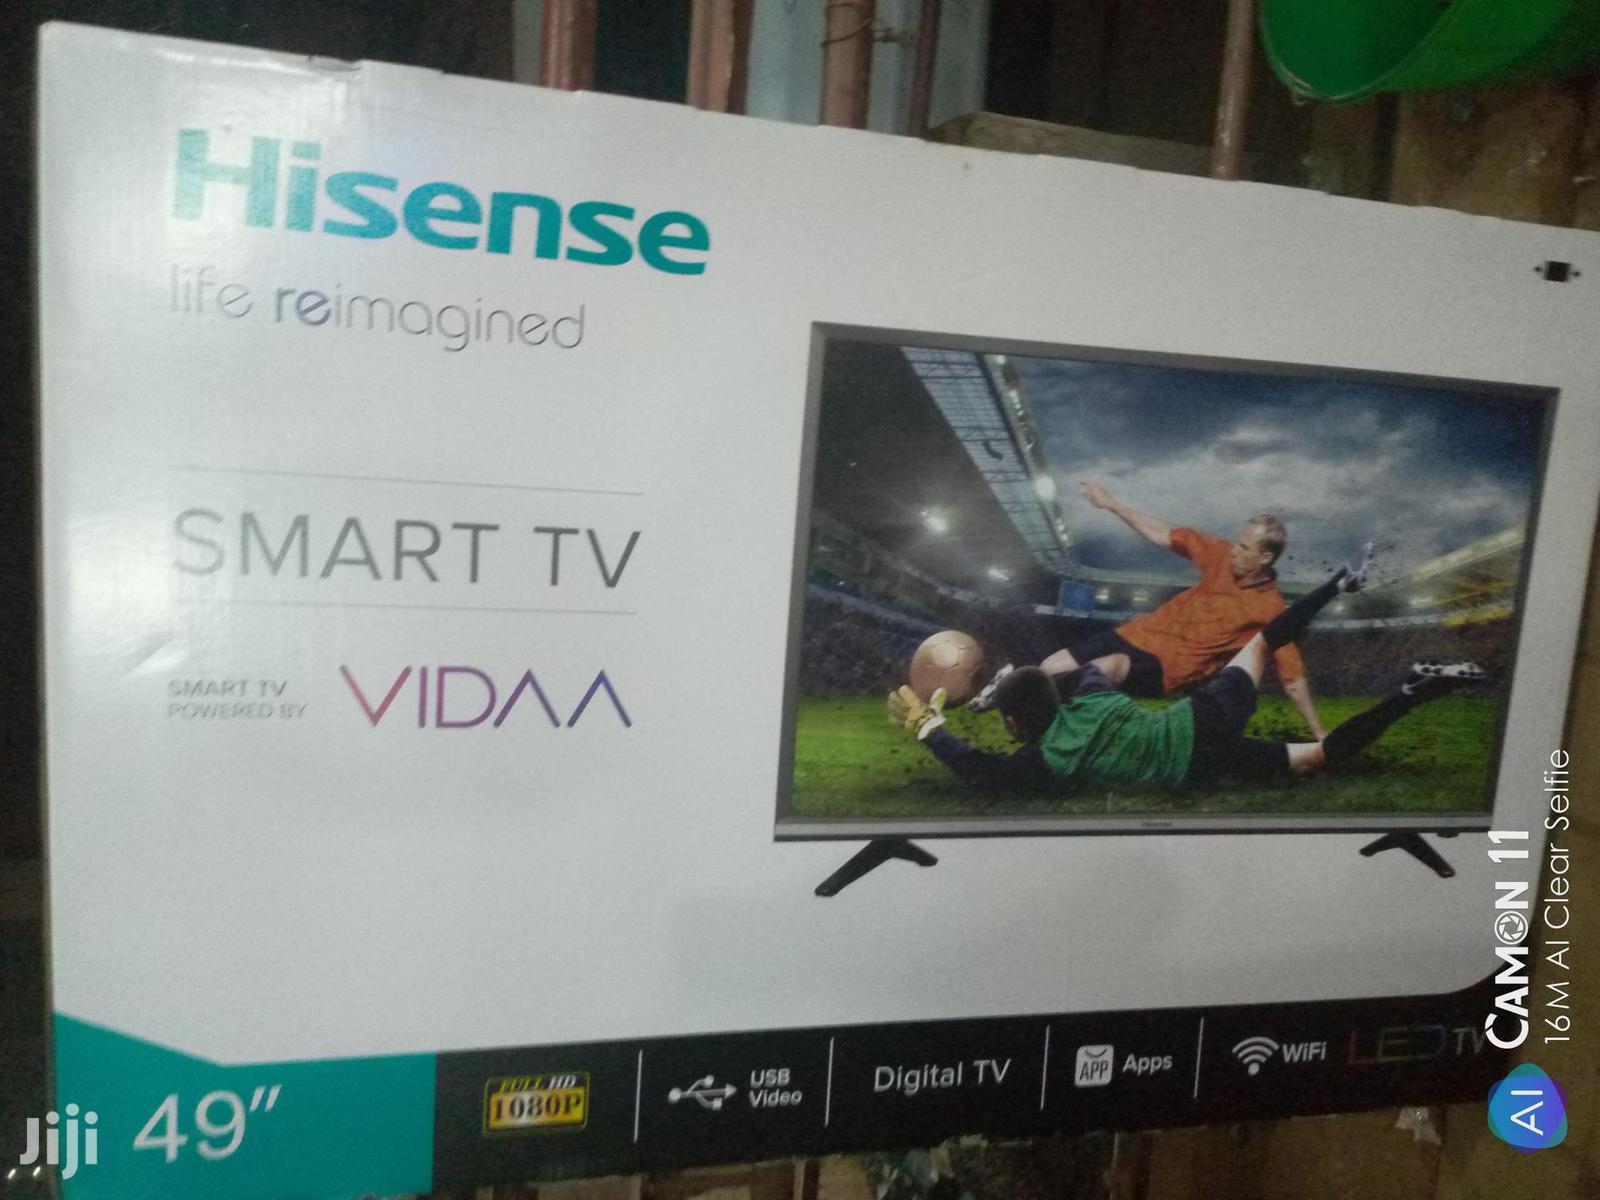 Hisense Smart Flat Screen Tv 49 Inches